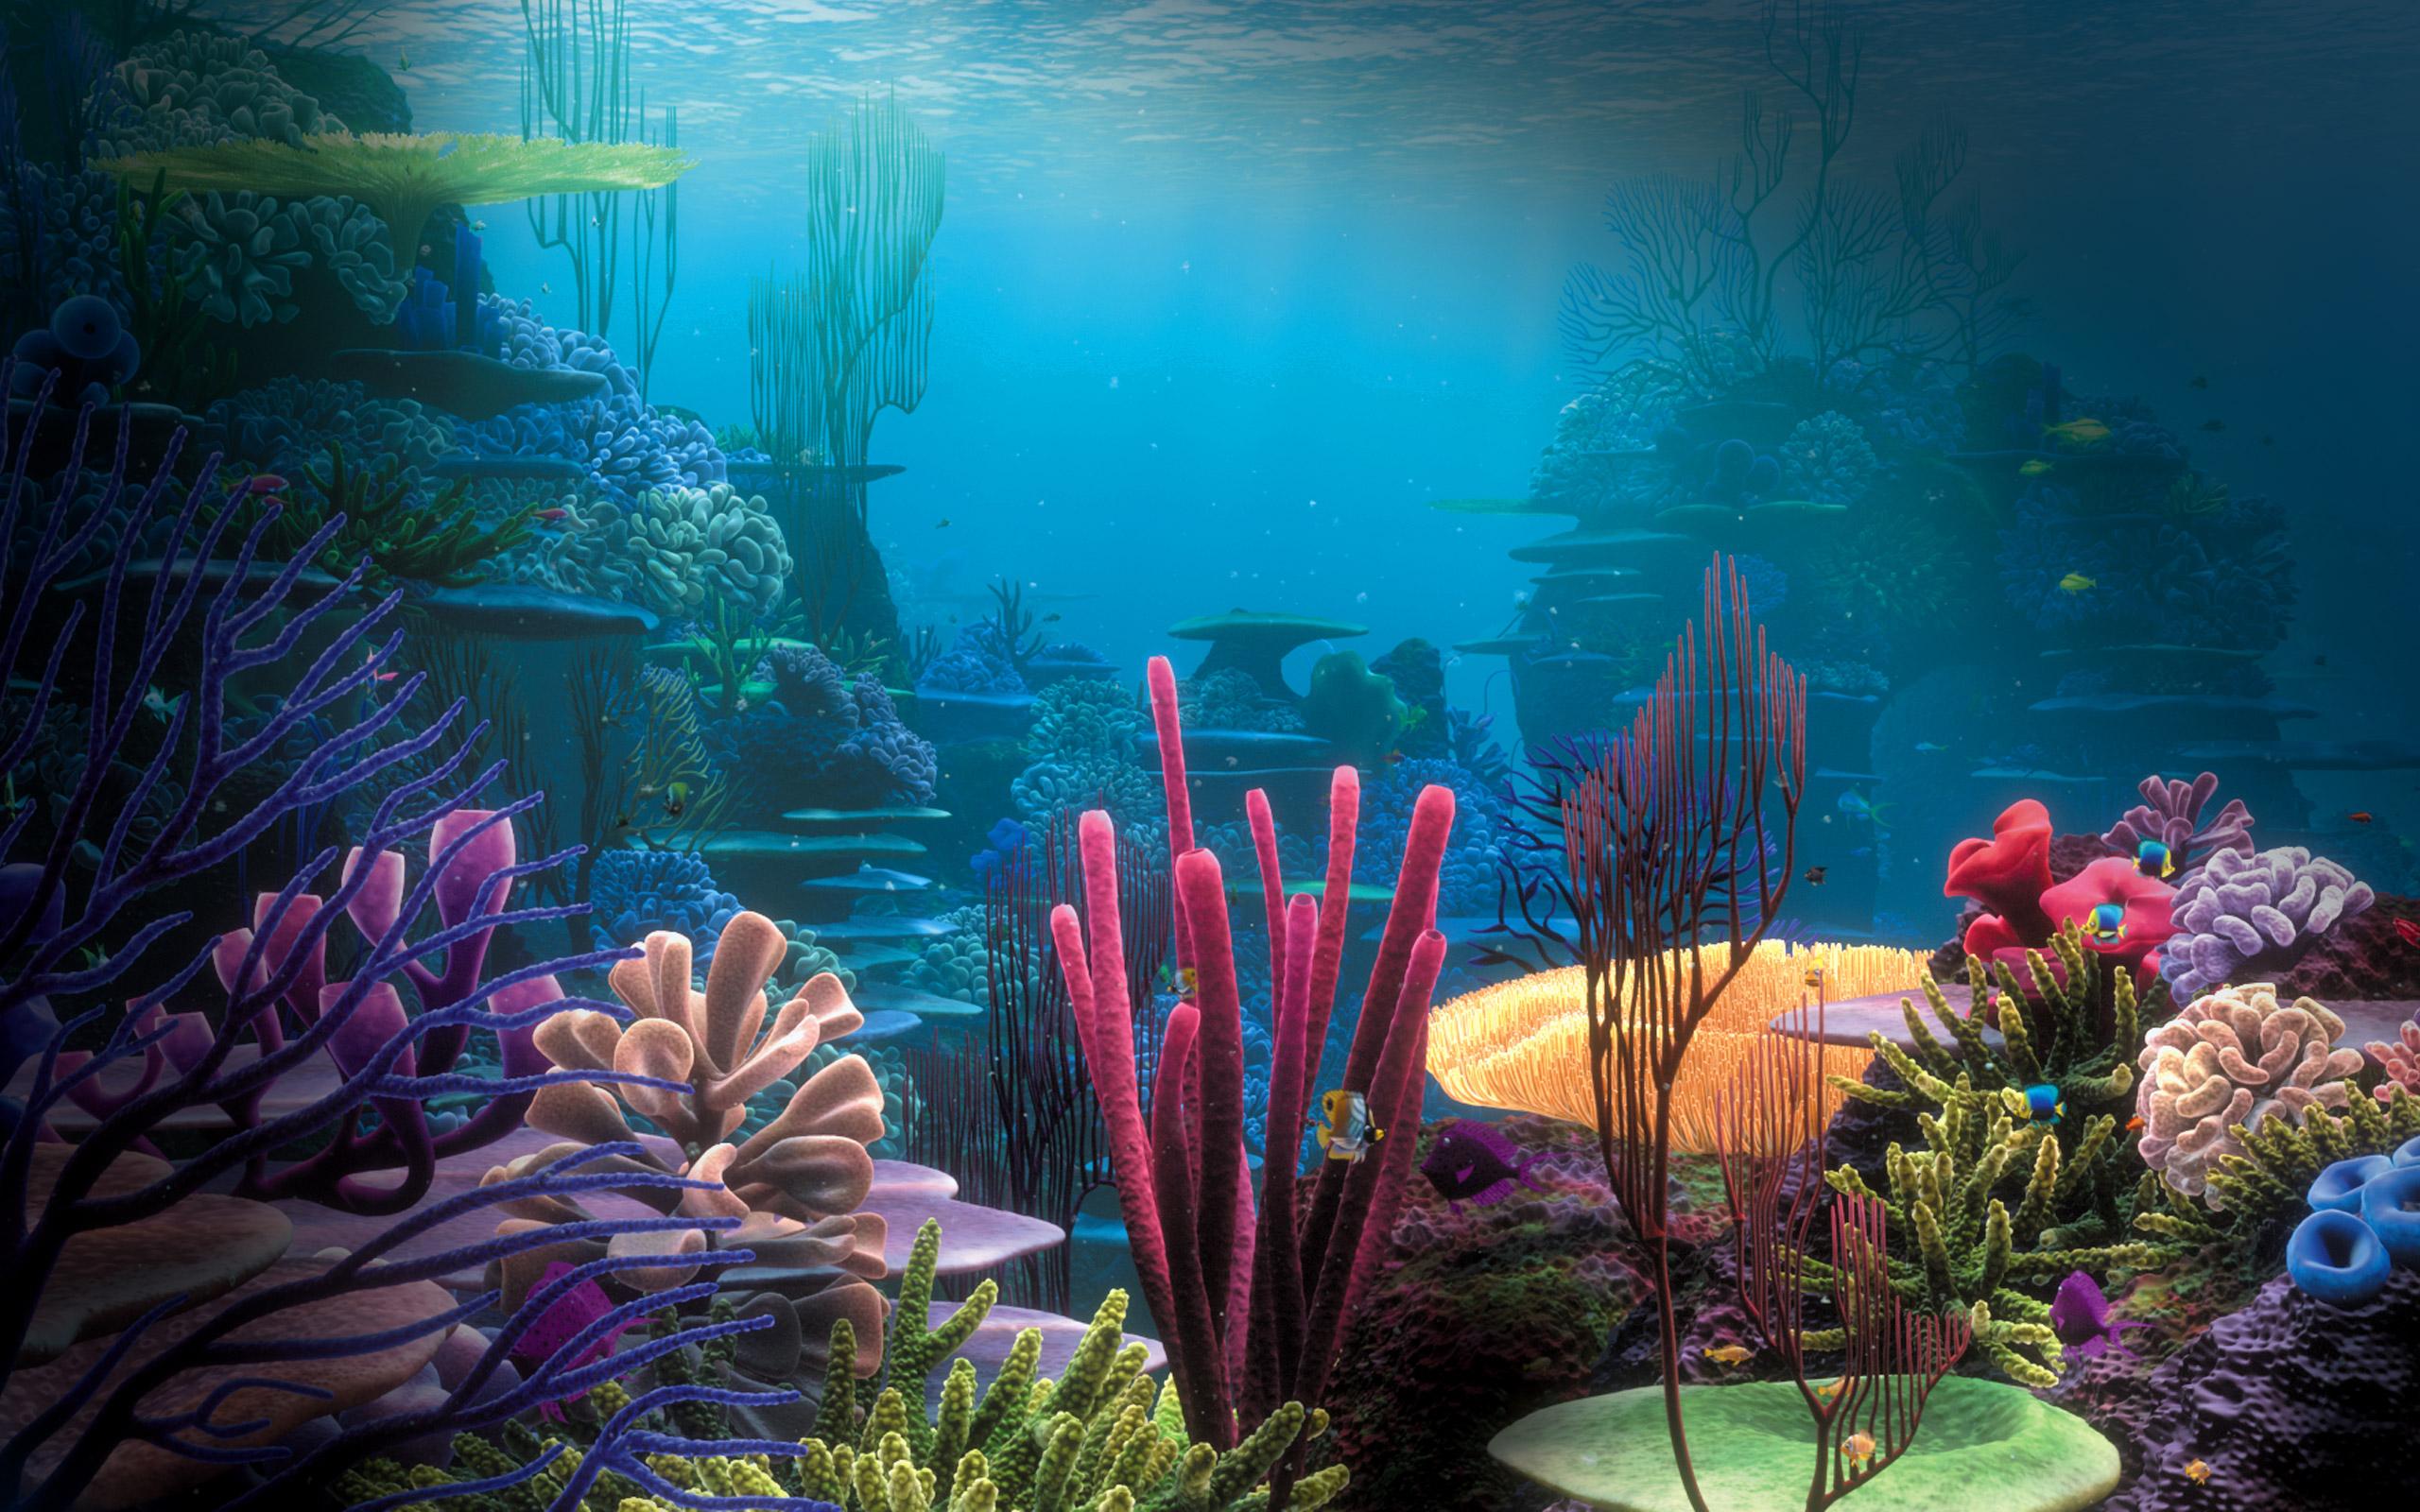 Amazoncom Color Me Mindful Underwater 9781501130878